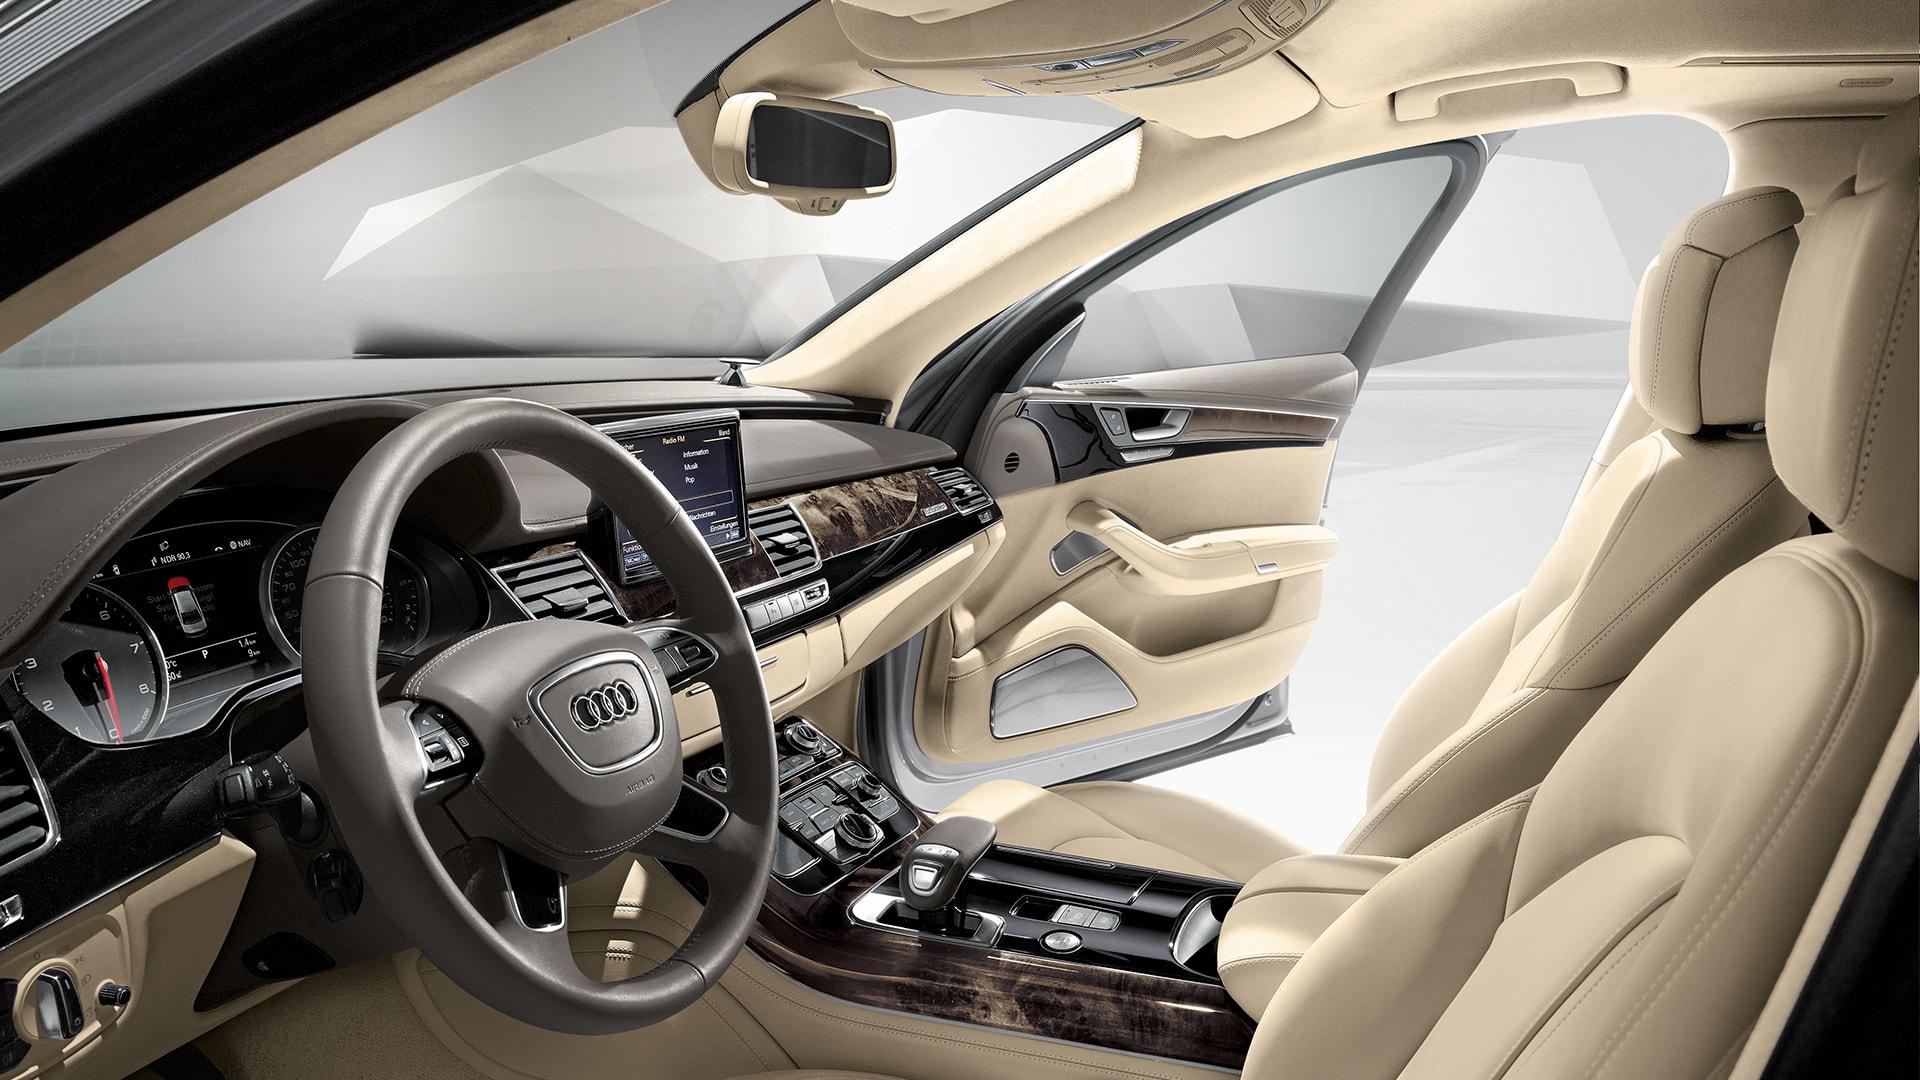 Audi A8 (D5) HQ wallpapers